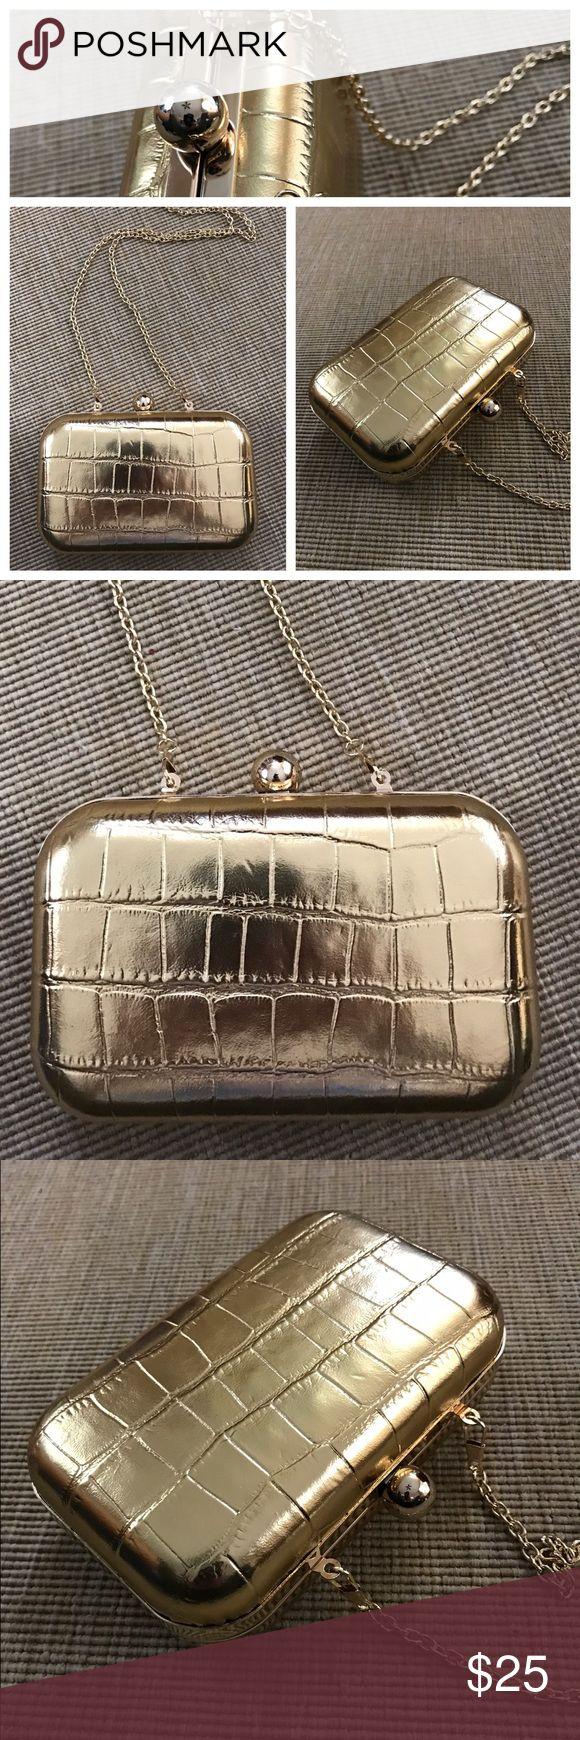 "Gold Croc Print Box Purse Harvey Nichols London Brand new, Gold crocodile print box purse by Harvey Nichols, London, U.K. Detachable chain strap - 23"" long. 2"" X 6"" X 2"". Stunning- a real statement piece. Harvey Nichols, London Bags Shoulder Bags"